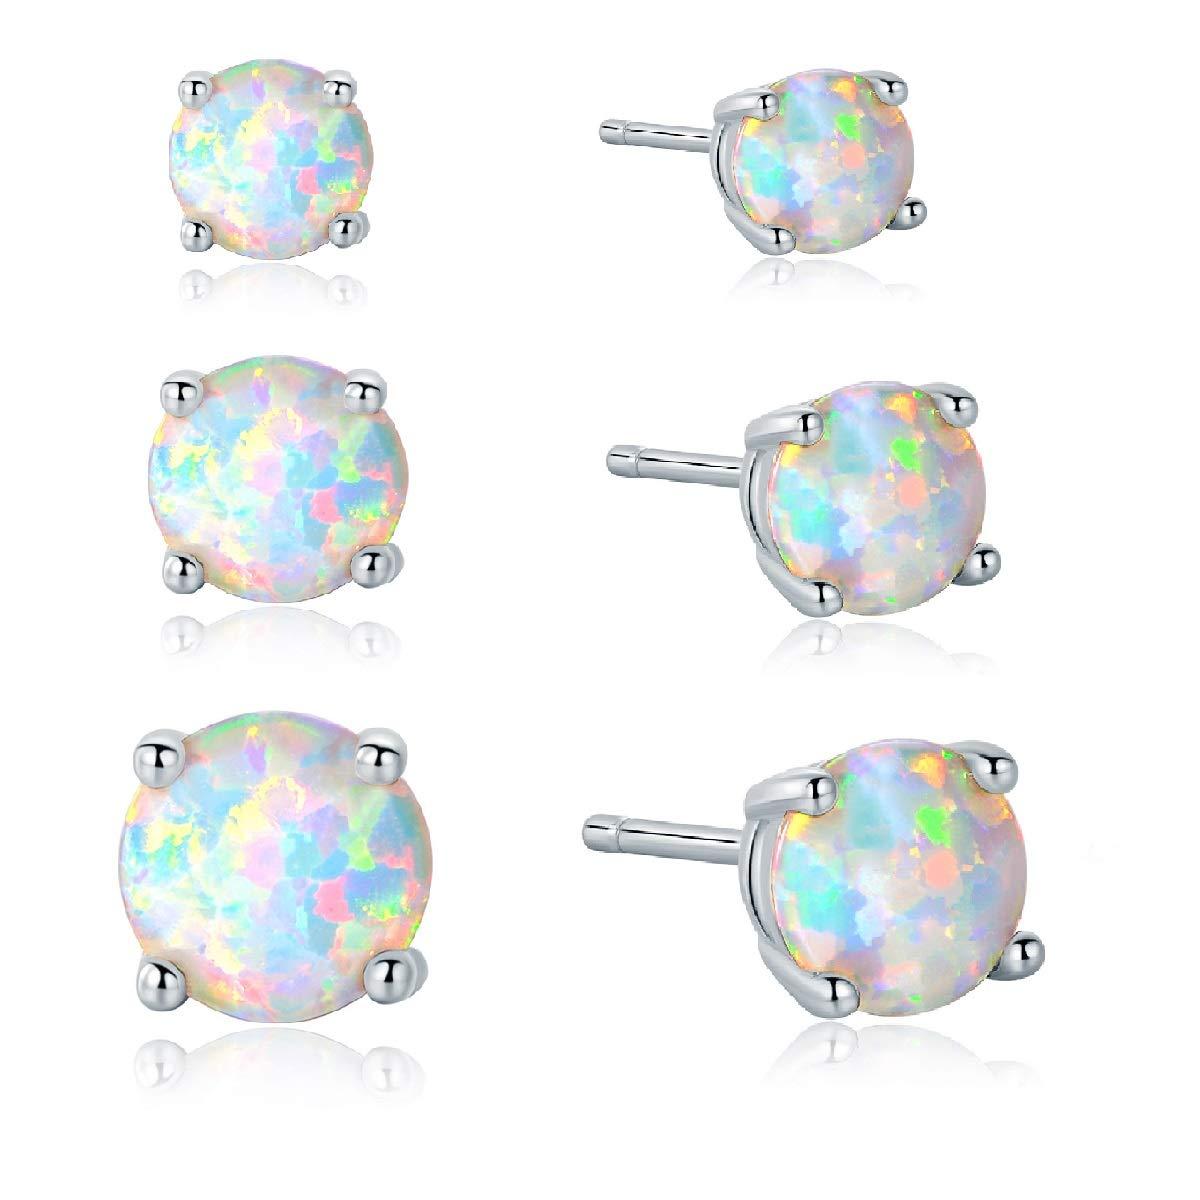 GMESME 925 Sterling Silver Round Created Opal 6mm Birthstone Stud Earrings GEMSME E853S